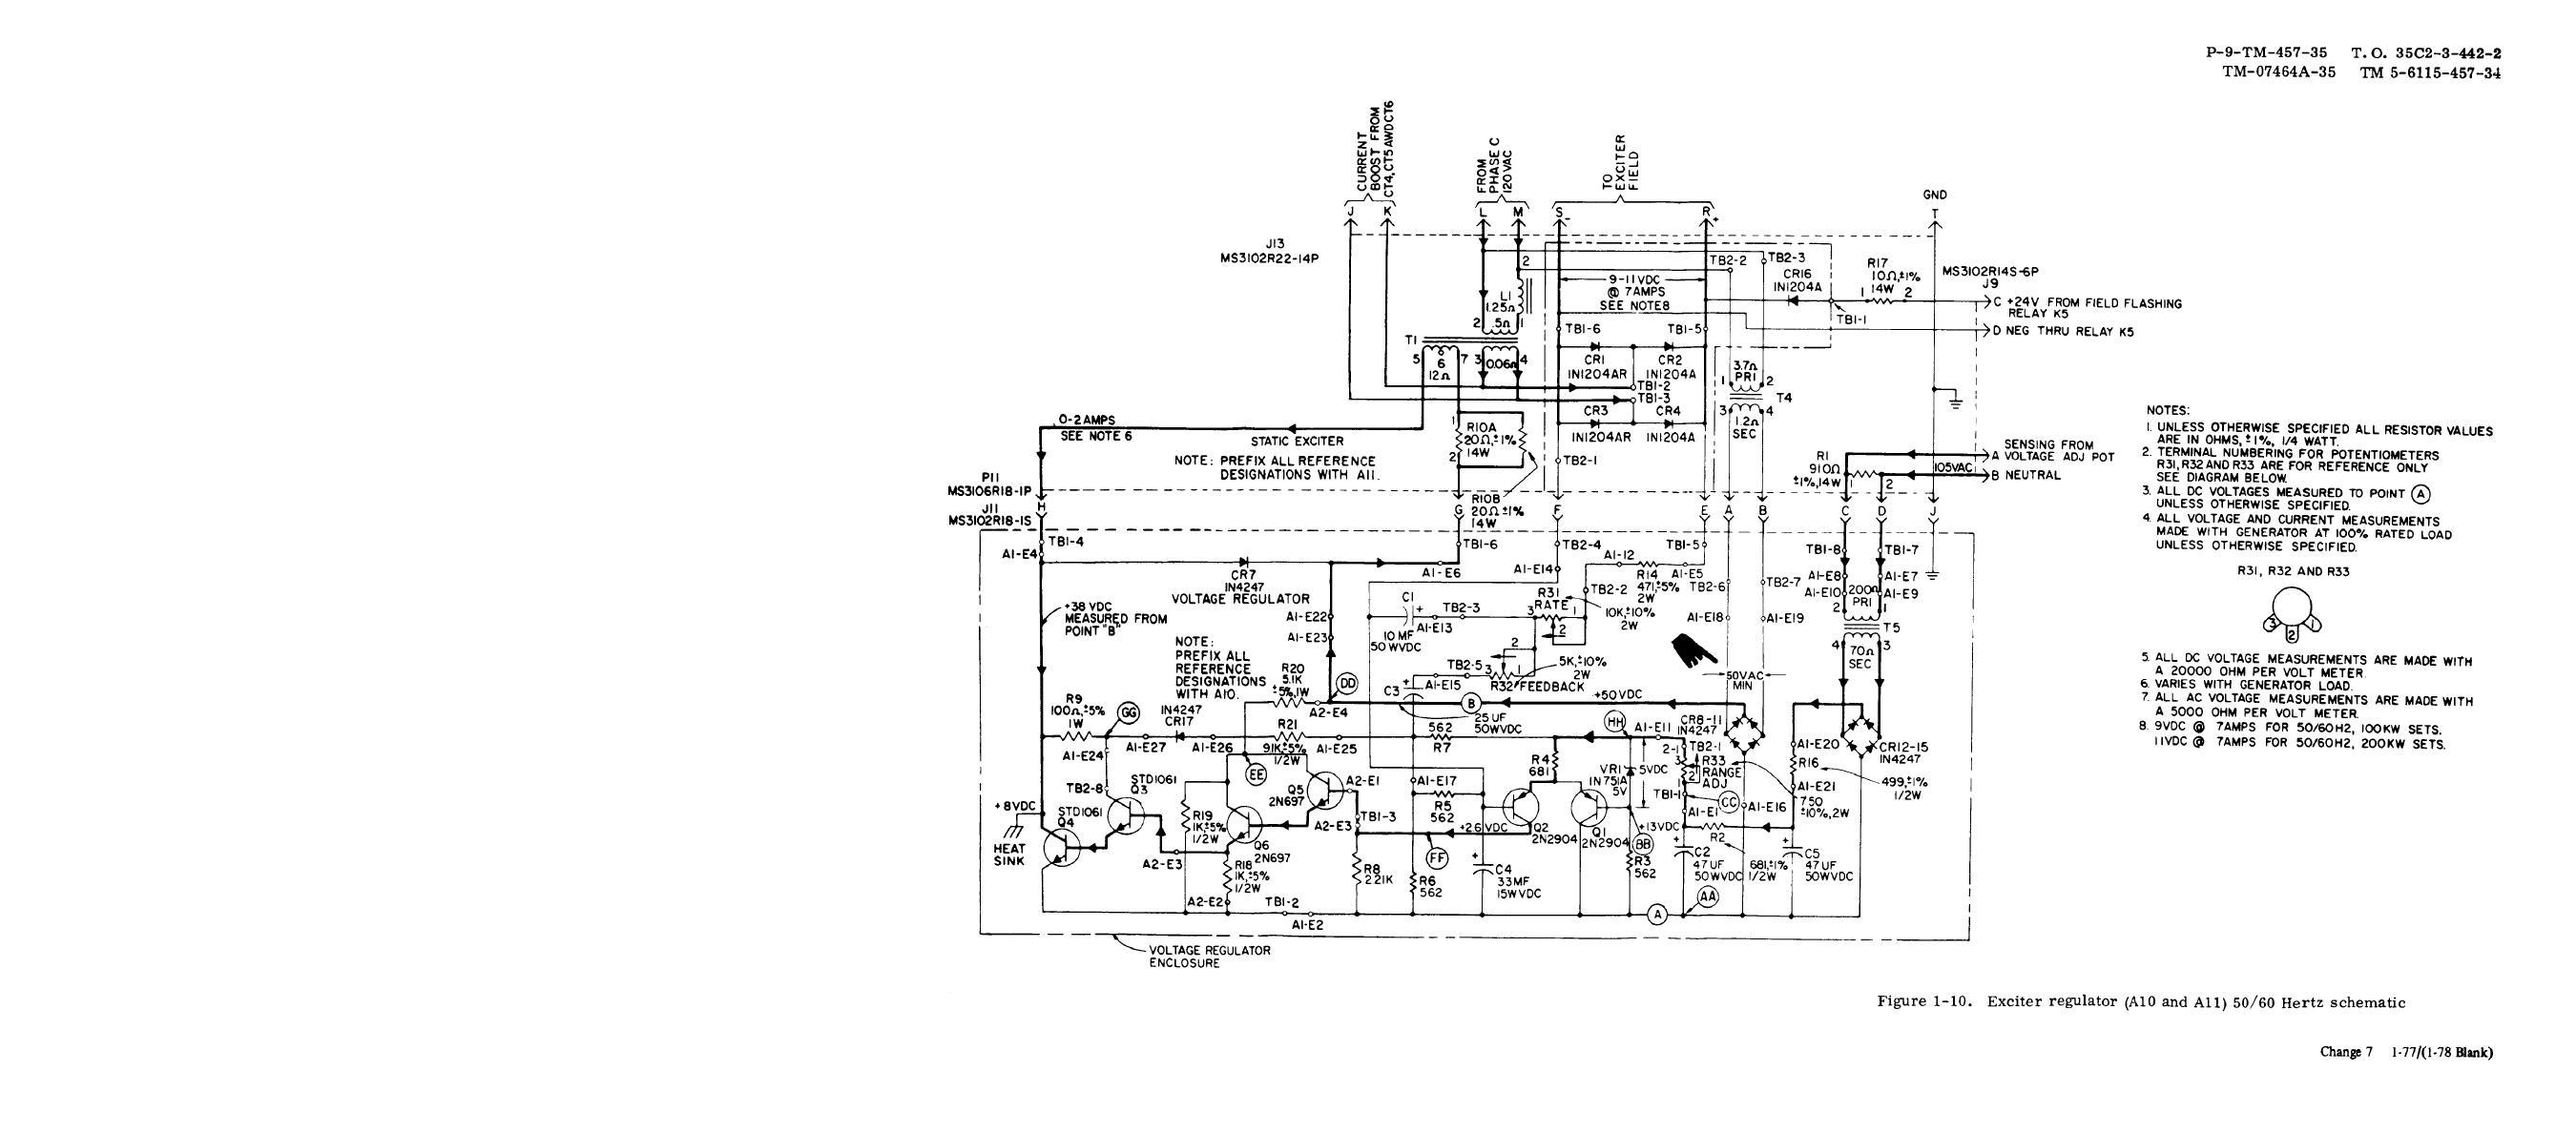 Figure 1 10 Exciter Regulator A10 And A11 50 60 Hertz